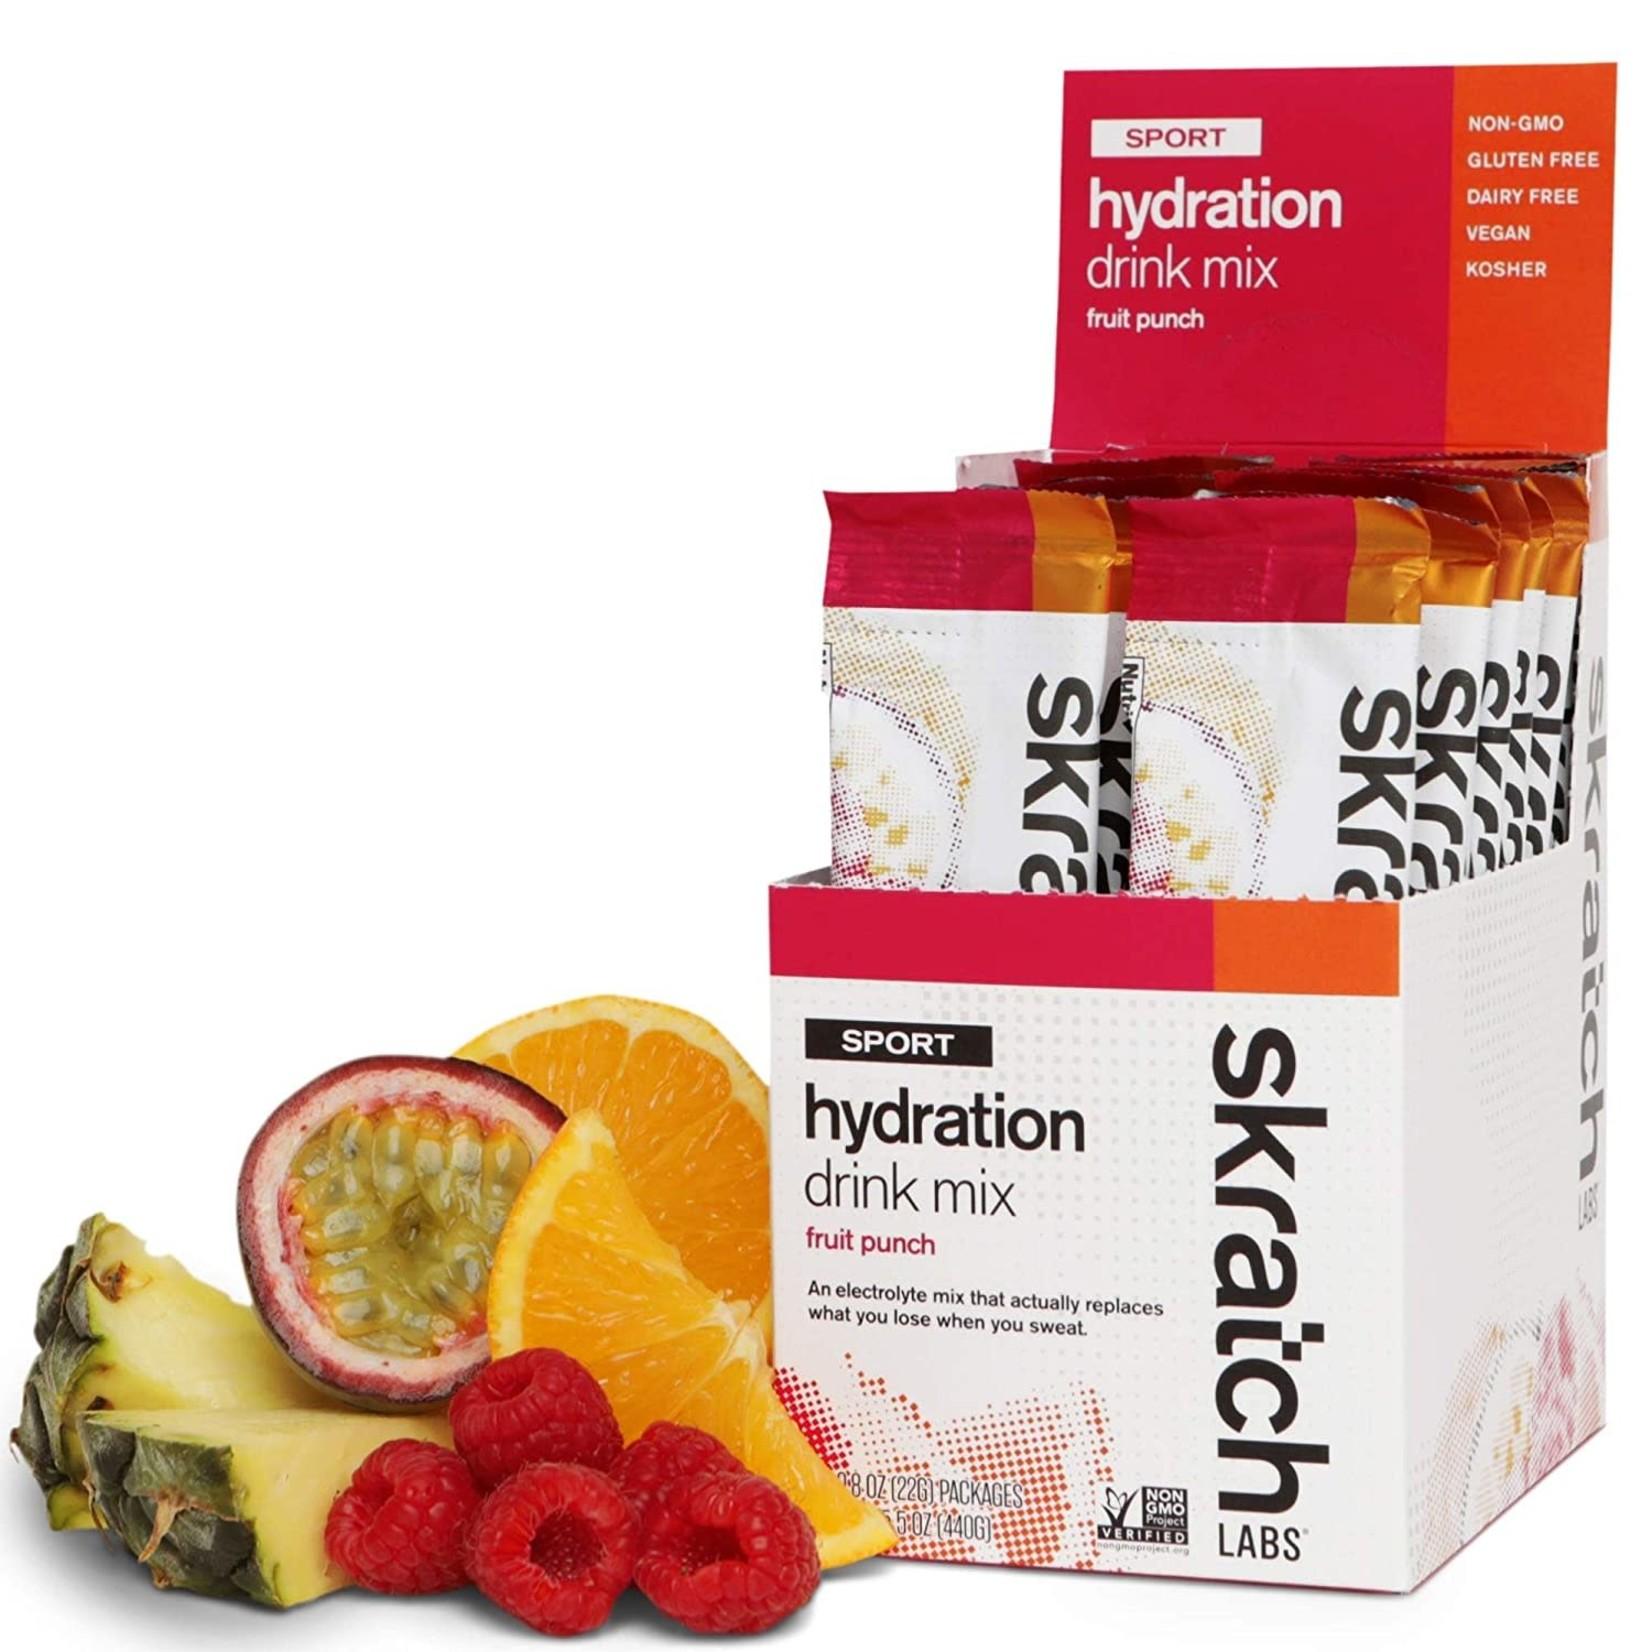 Skratch Labs Skratch Labs Sport Hydration Drink Mix - Fruit Punch